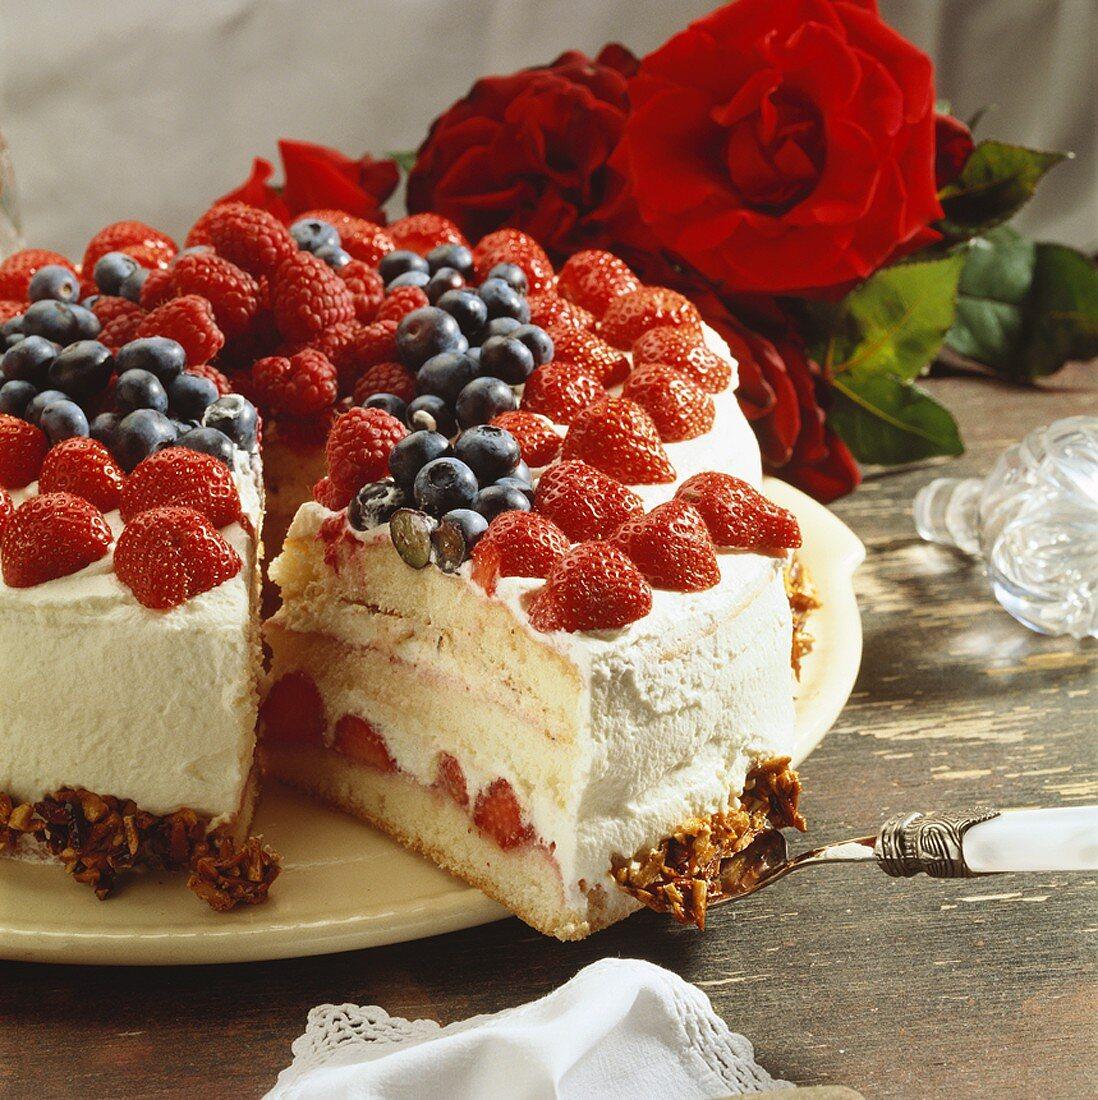 Mixed berry sponge cake, a piece cut